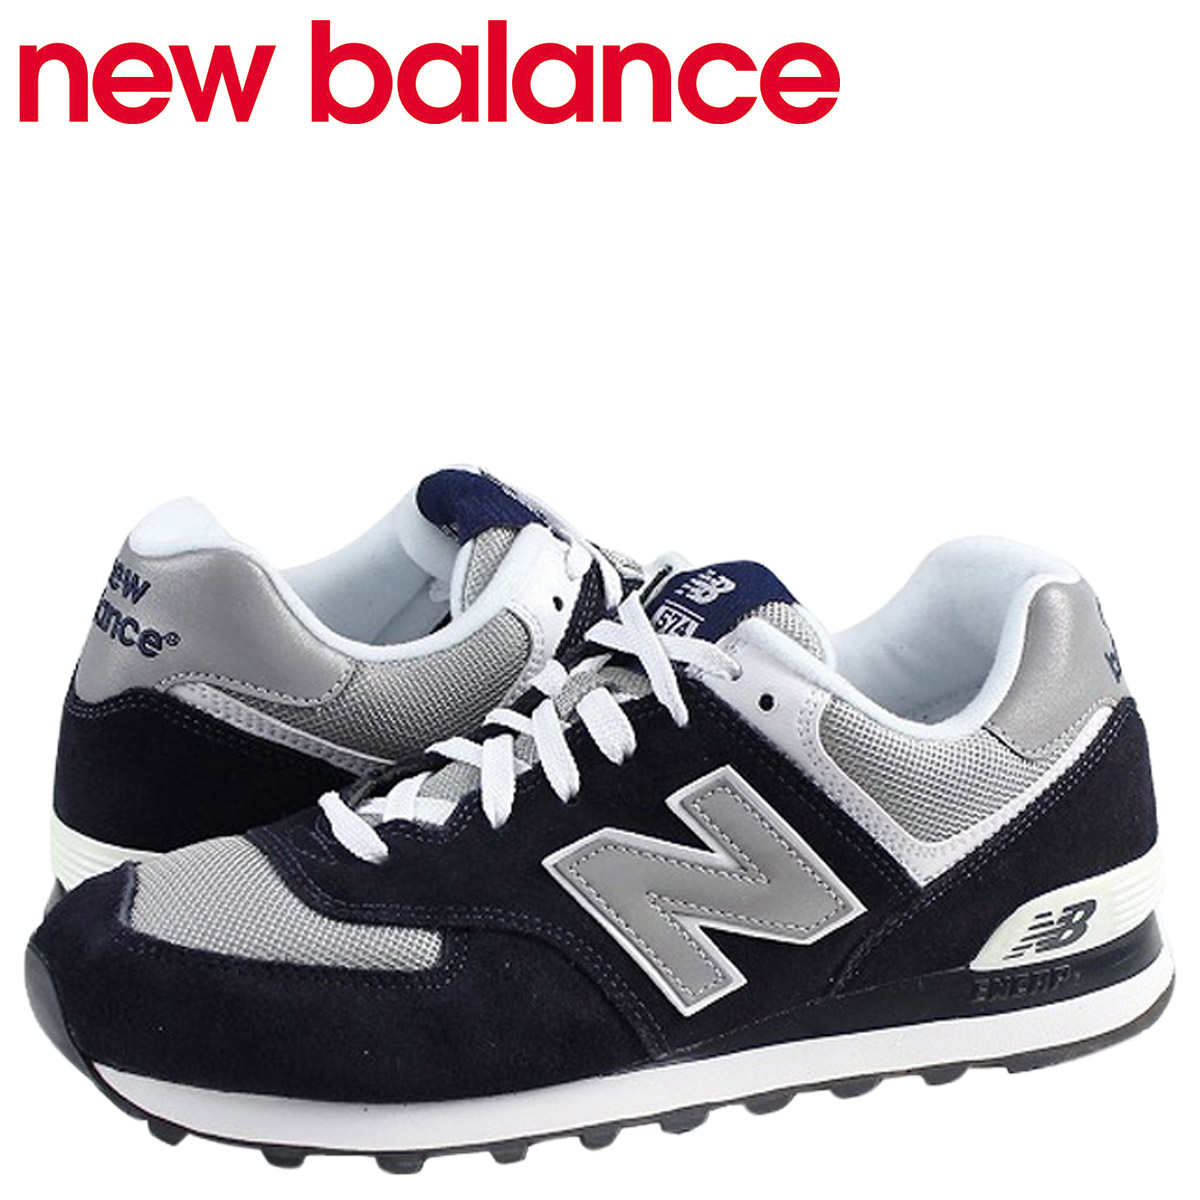 new balance 574 30.5